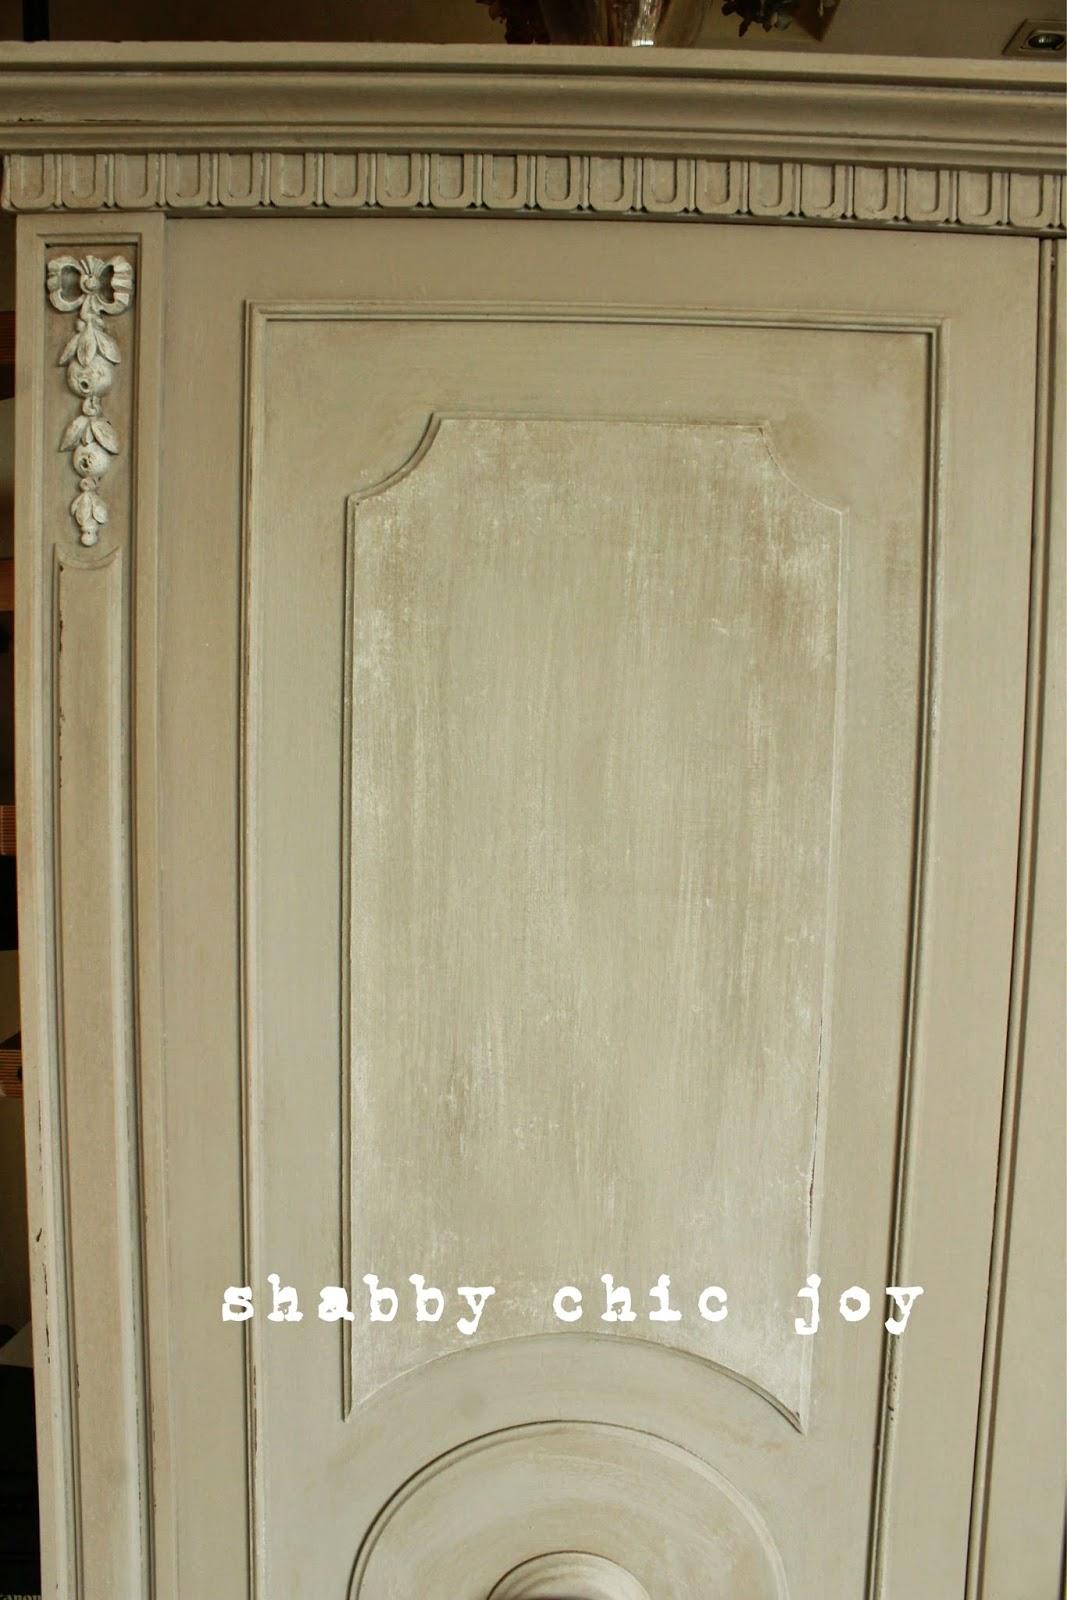 Shabby chic joy l 39 armadio per l 39 ingresso dal mercatino dell 39 usato a casa mia - Mobili bianchi shabby ...